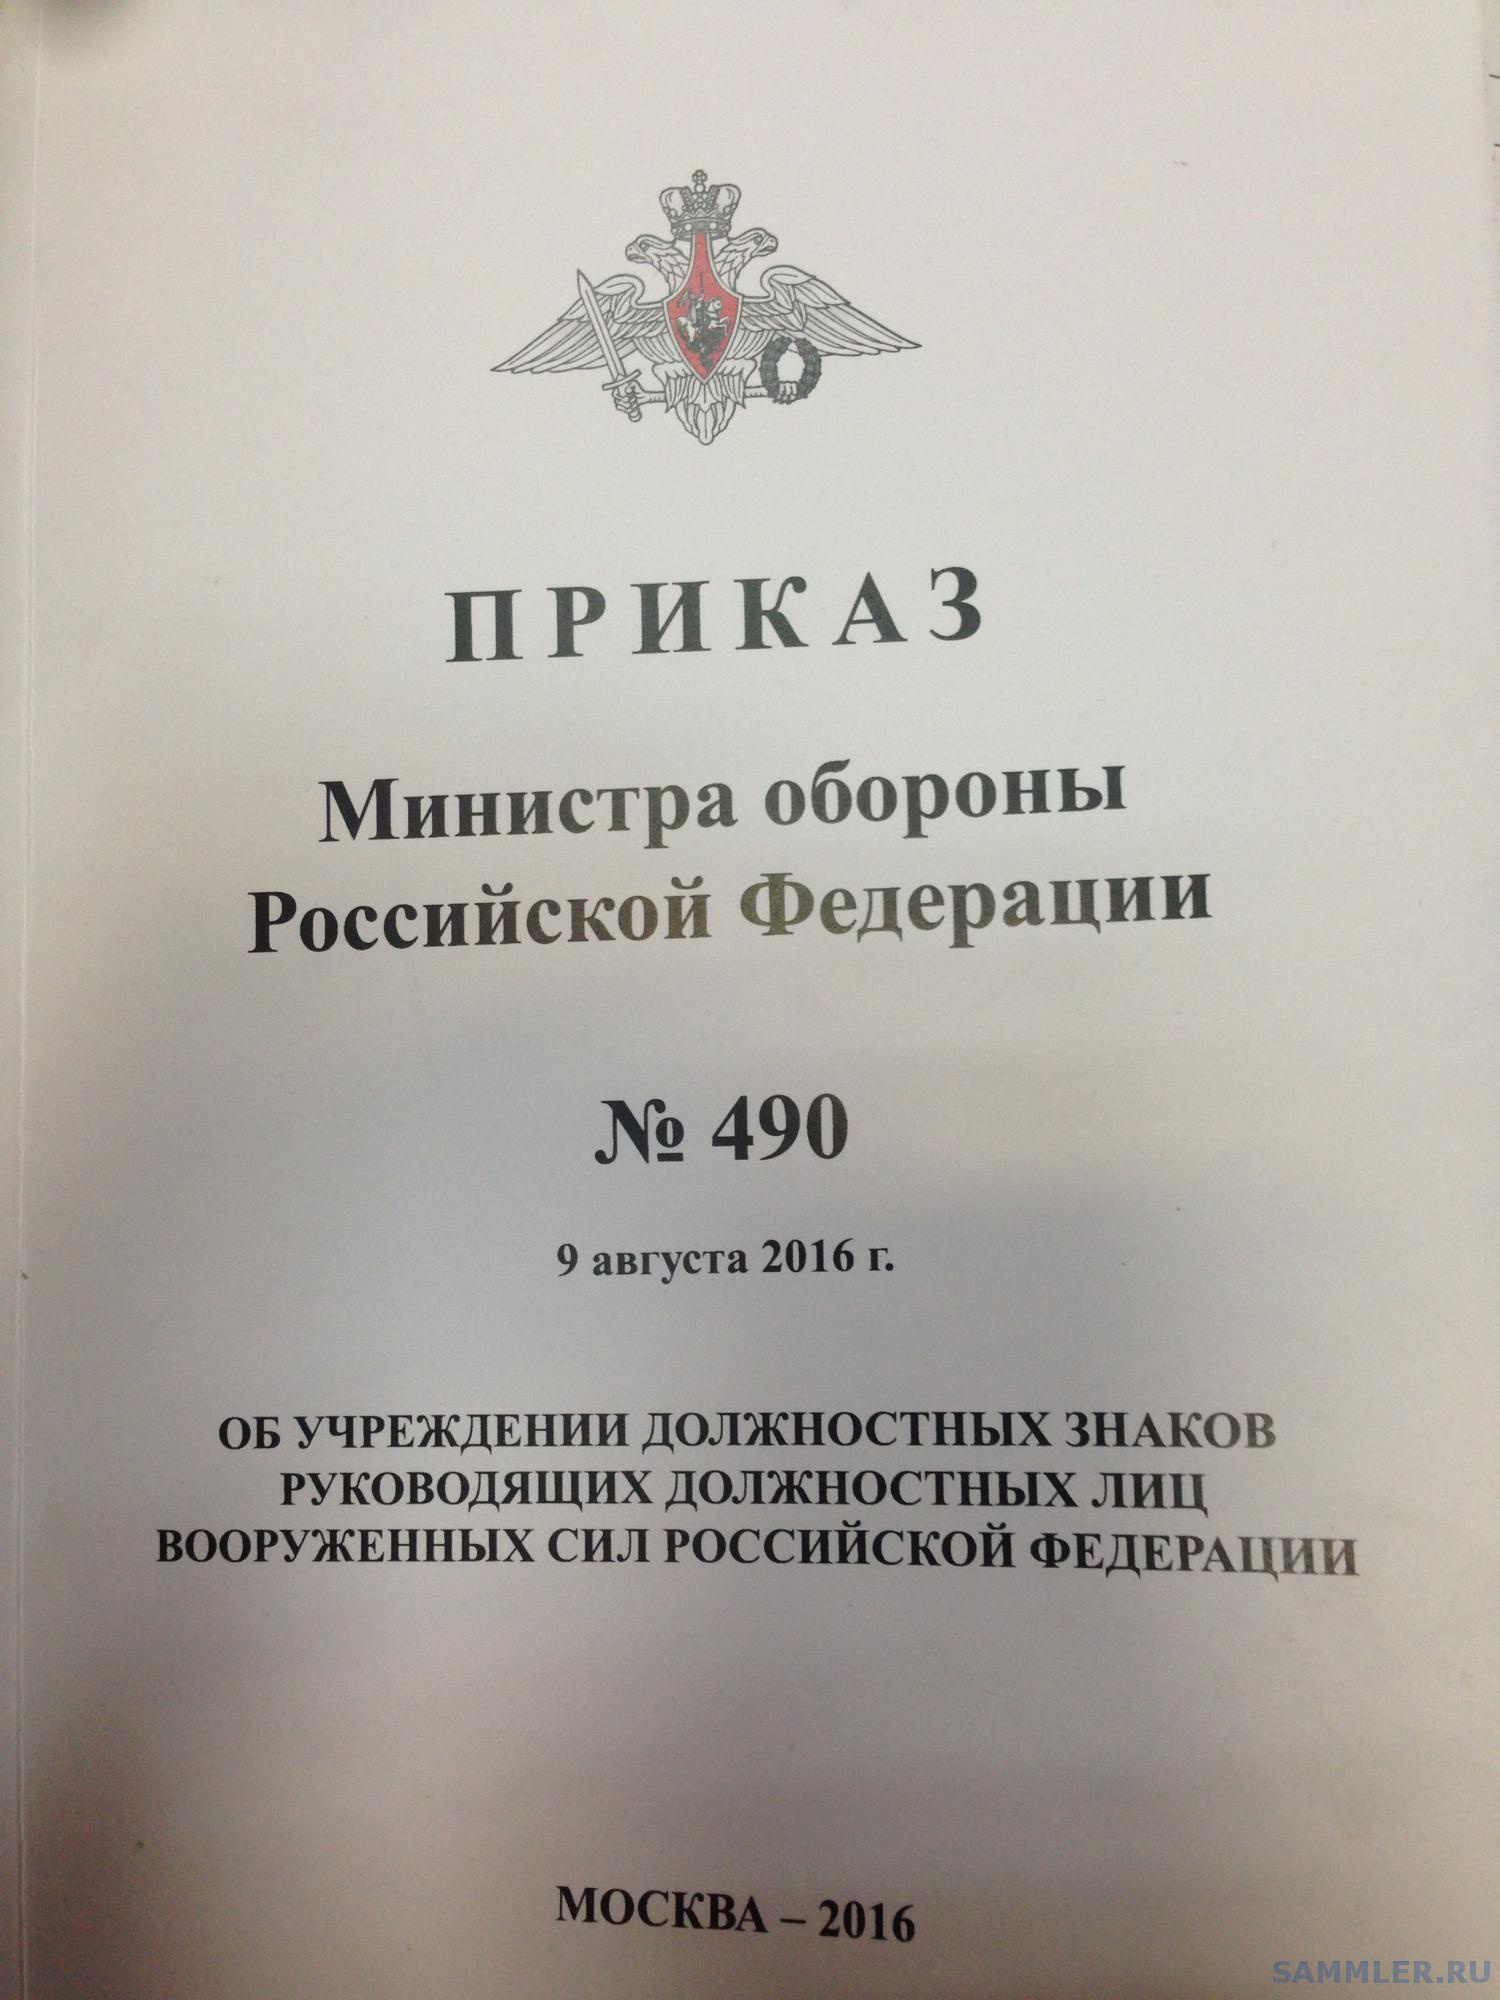 IMG_3311.JPG